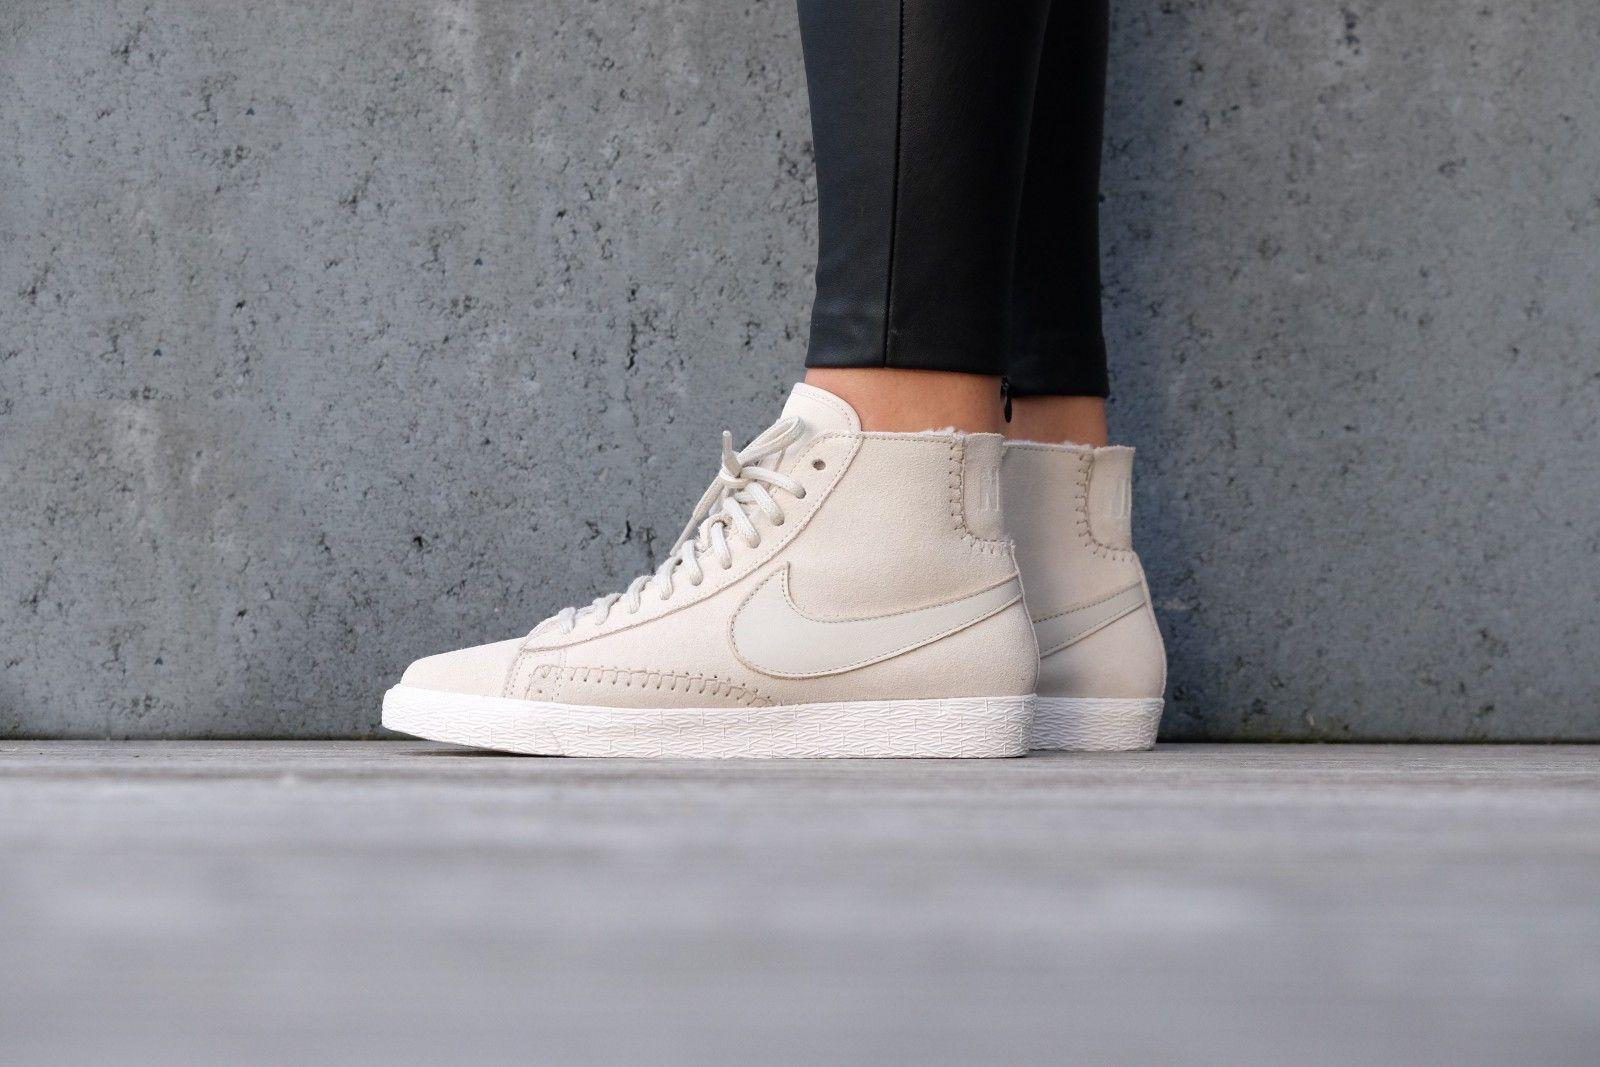 Nike Wmns Air Max 1 PRM (BirchBirch Ivory Gum Light Brown) | 454746 204